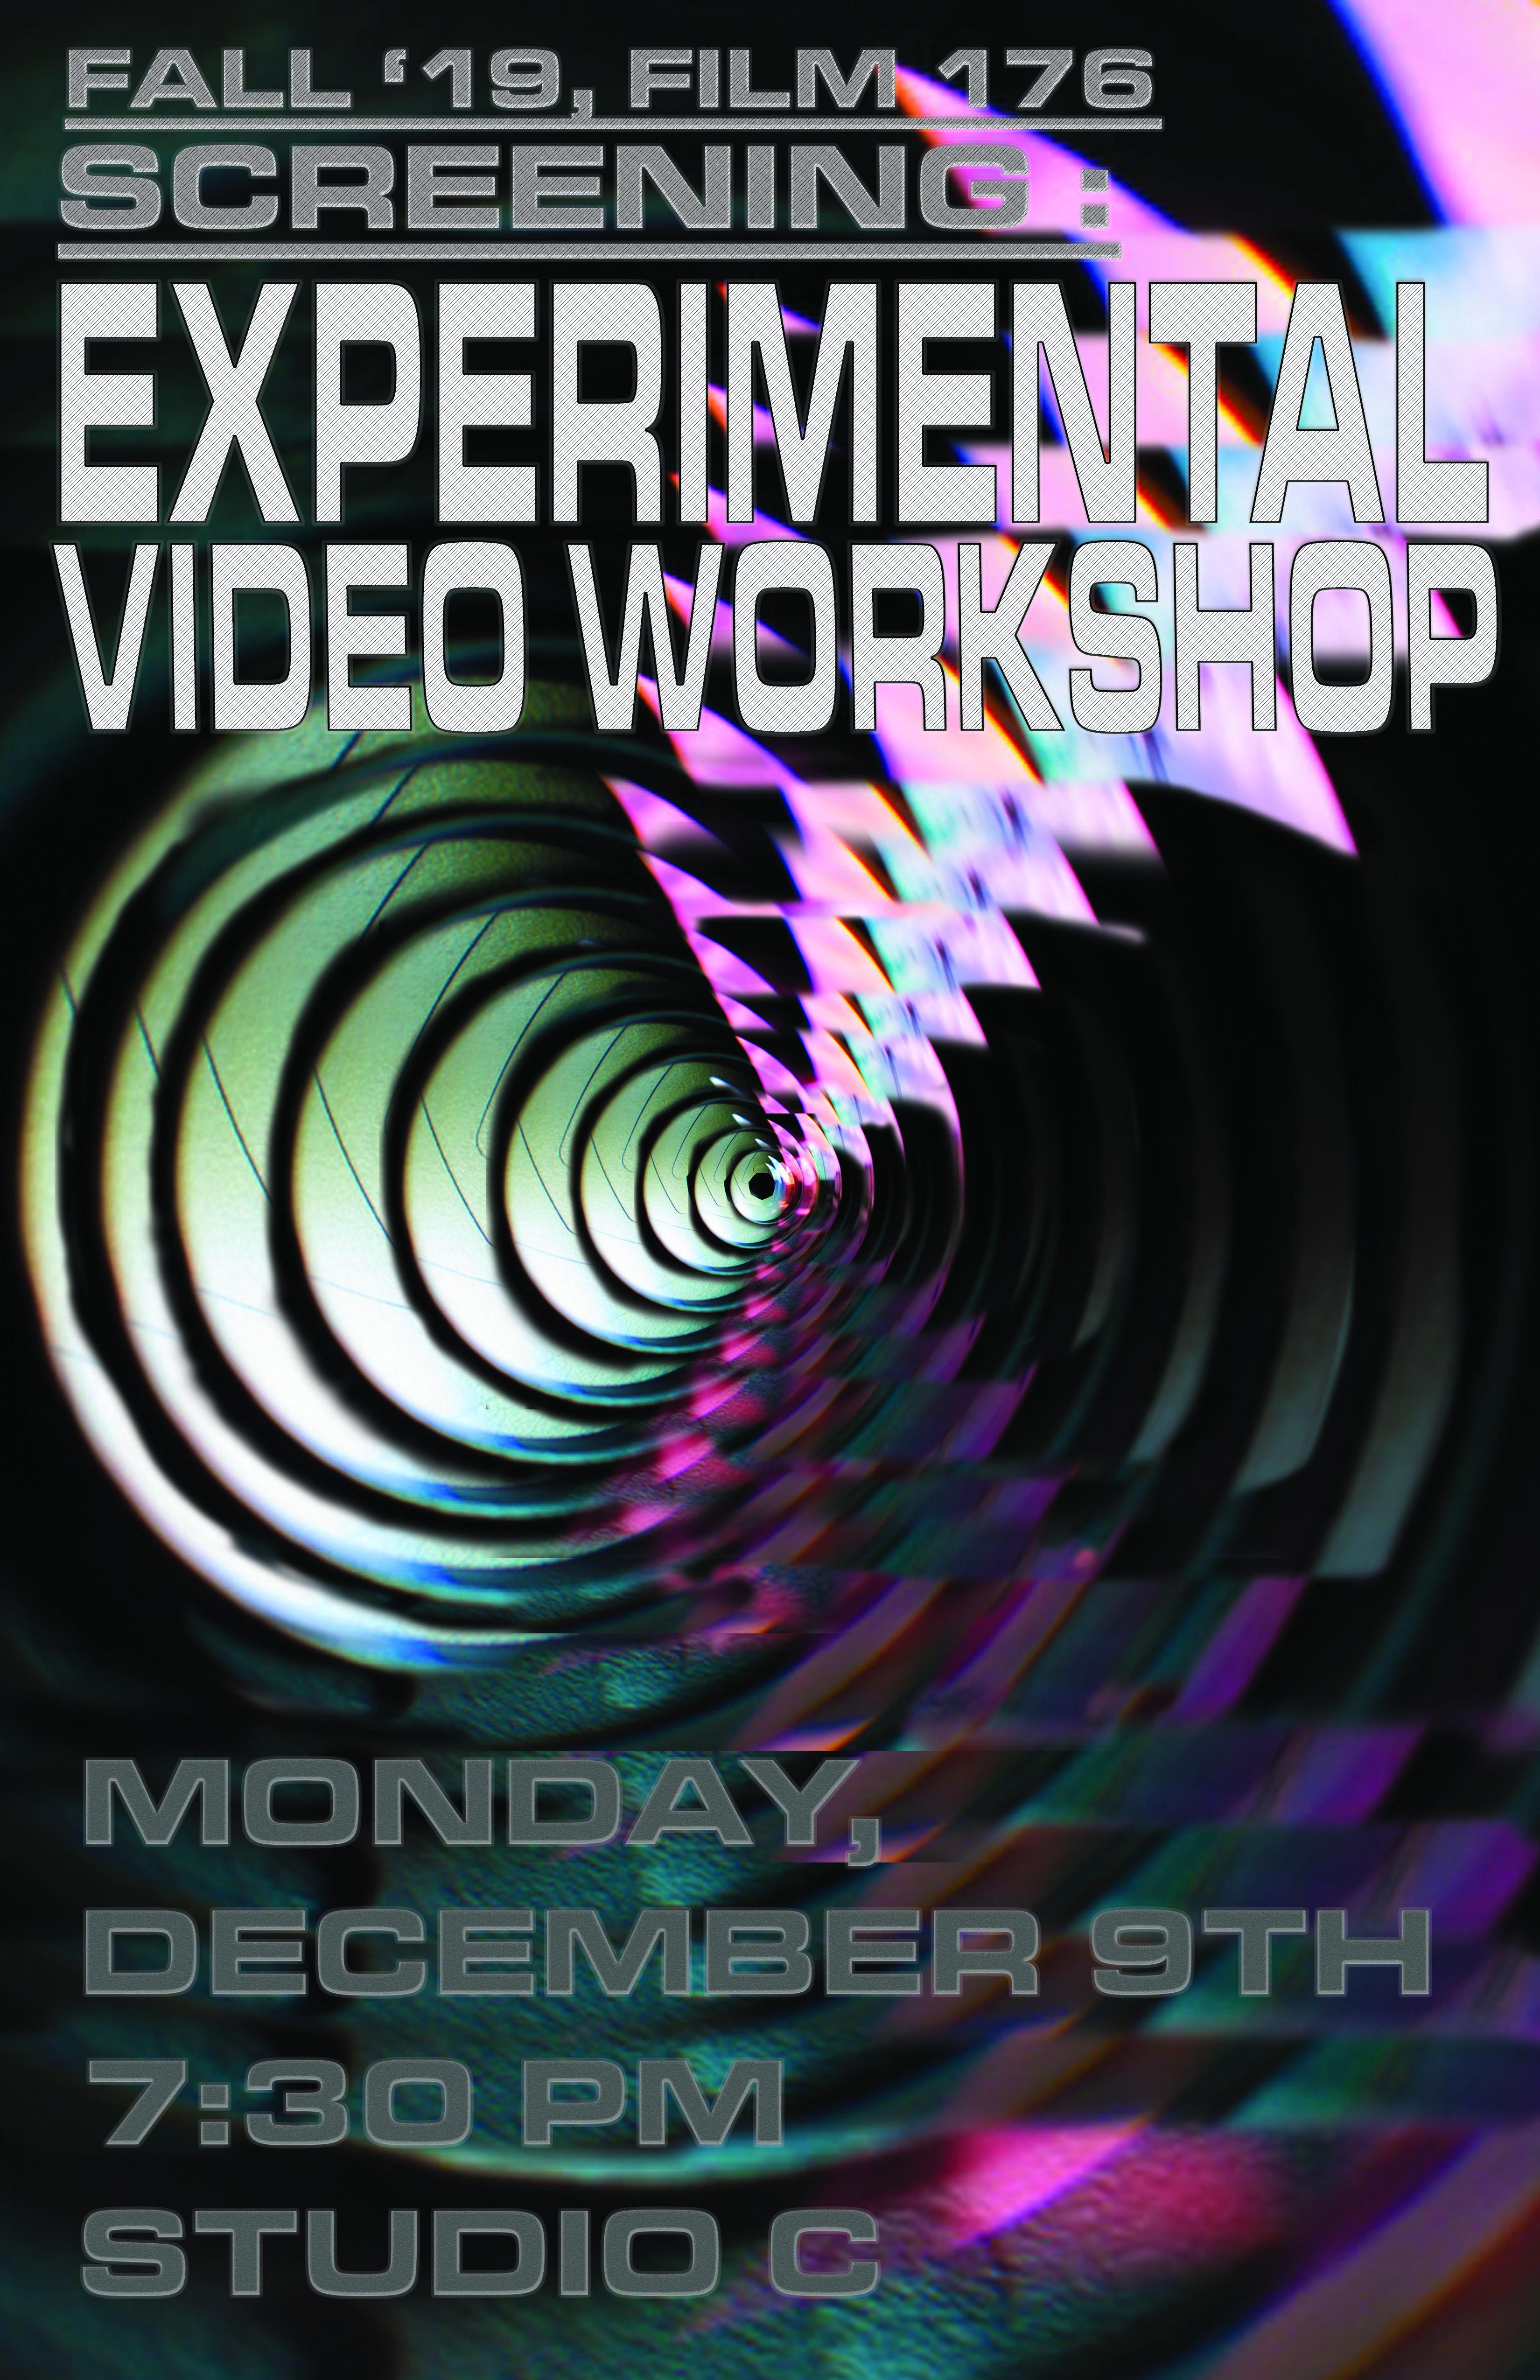 Flyer for Experimental Video Workshop final screening